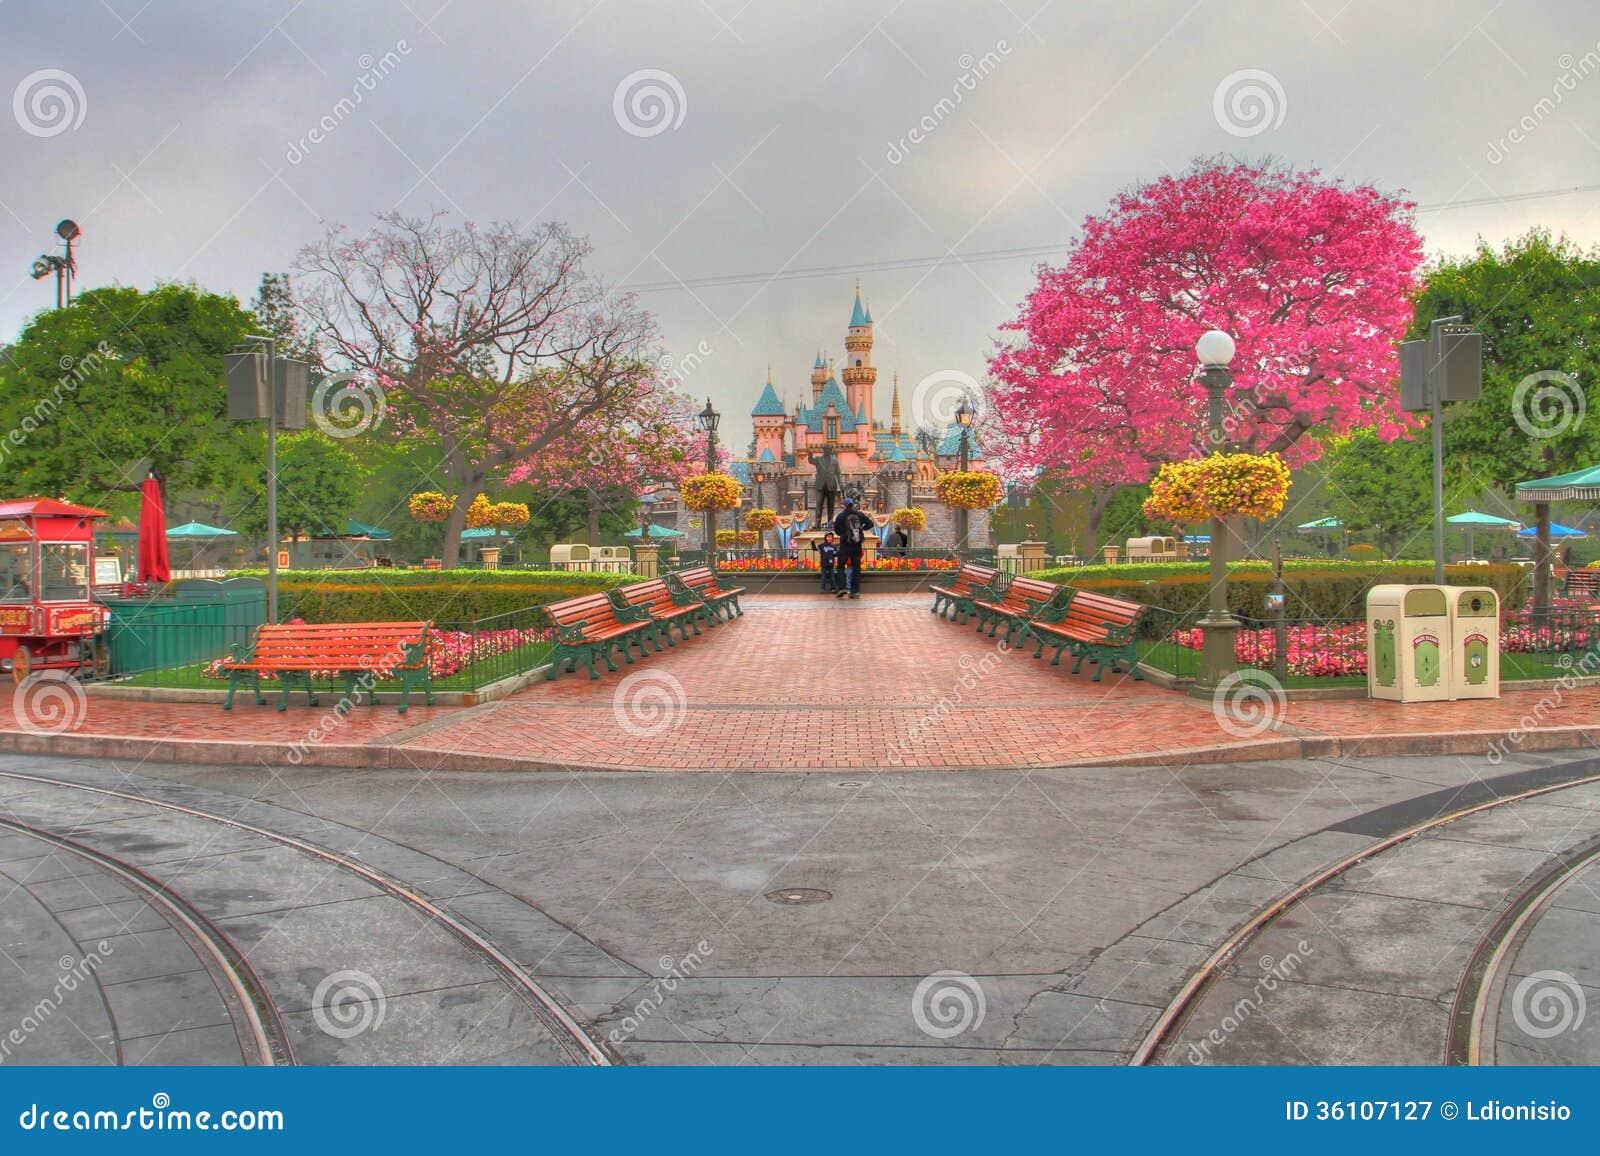 Disneyland HDR